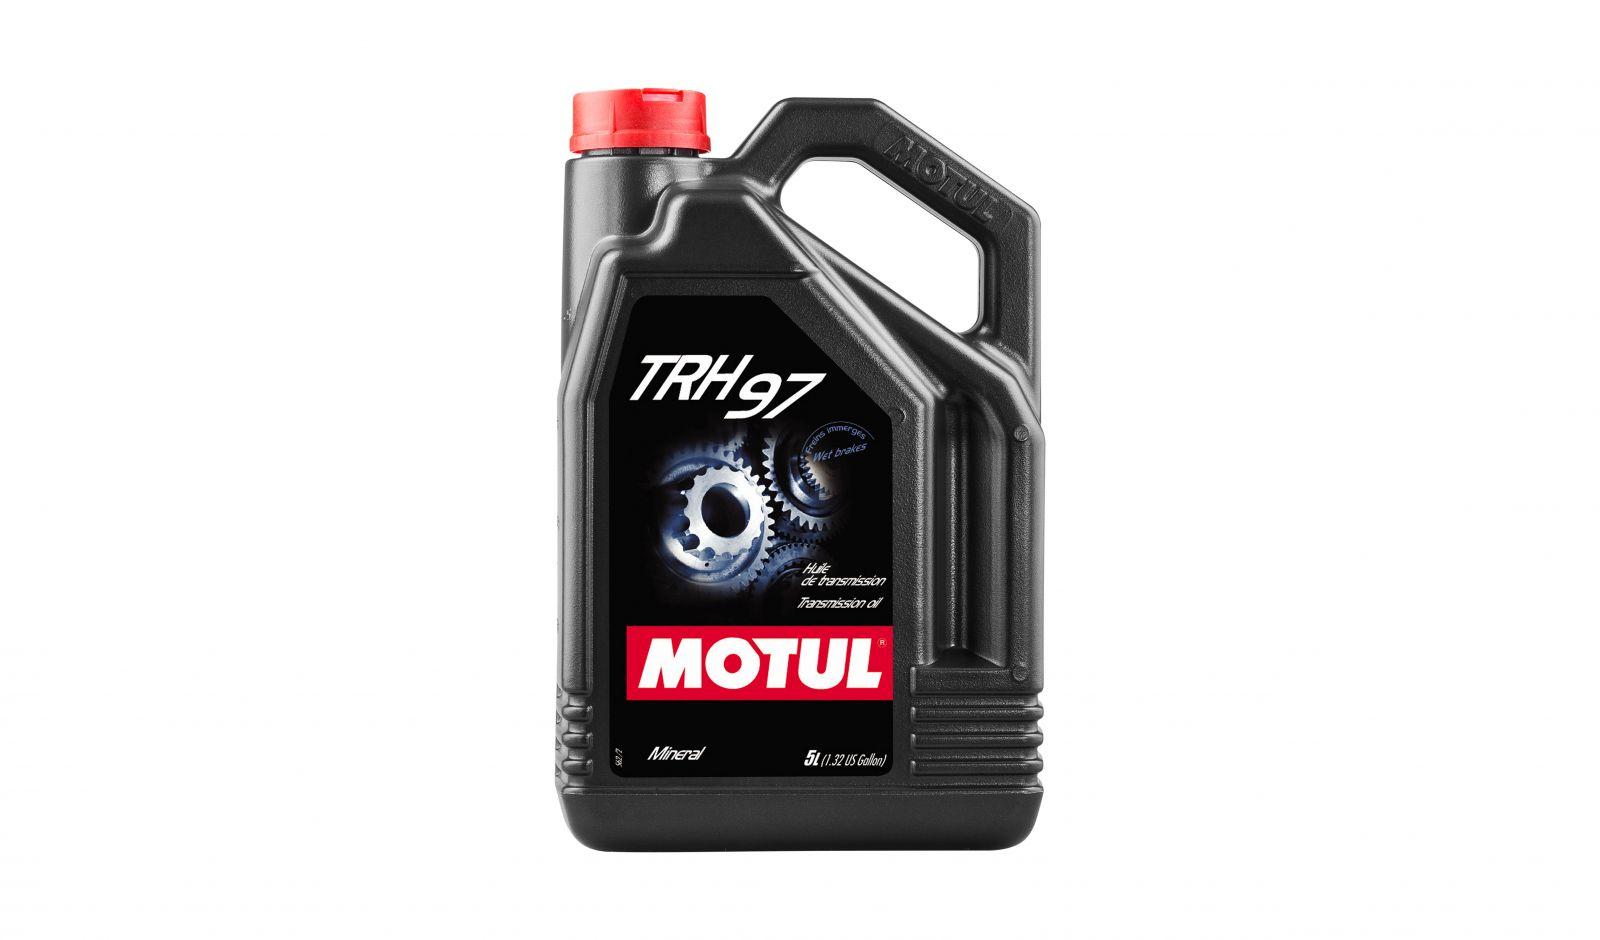 Transmission & Gear Oils - 670459M image